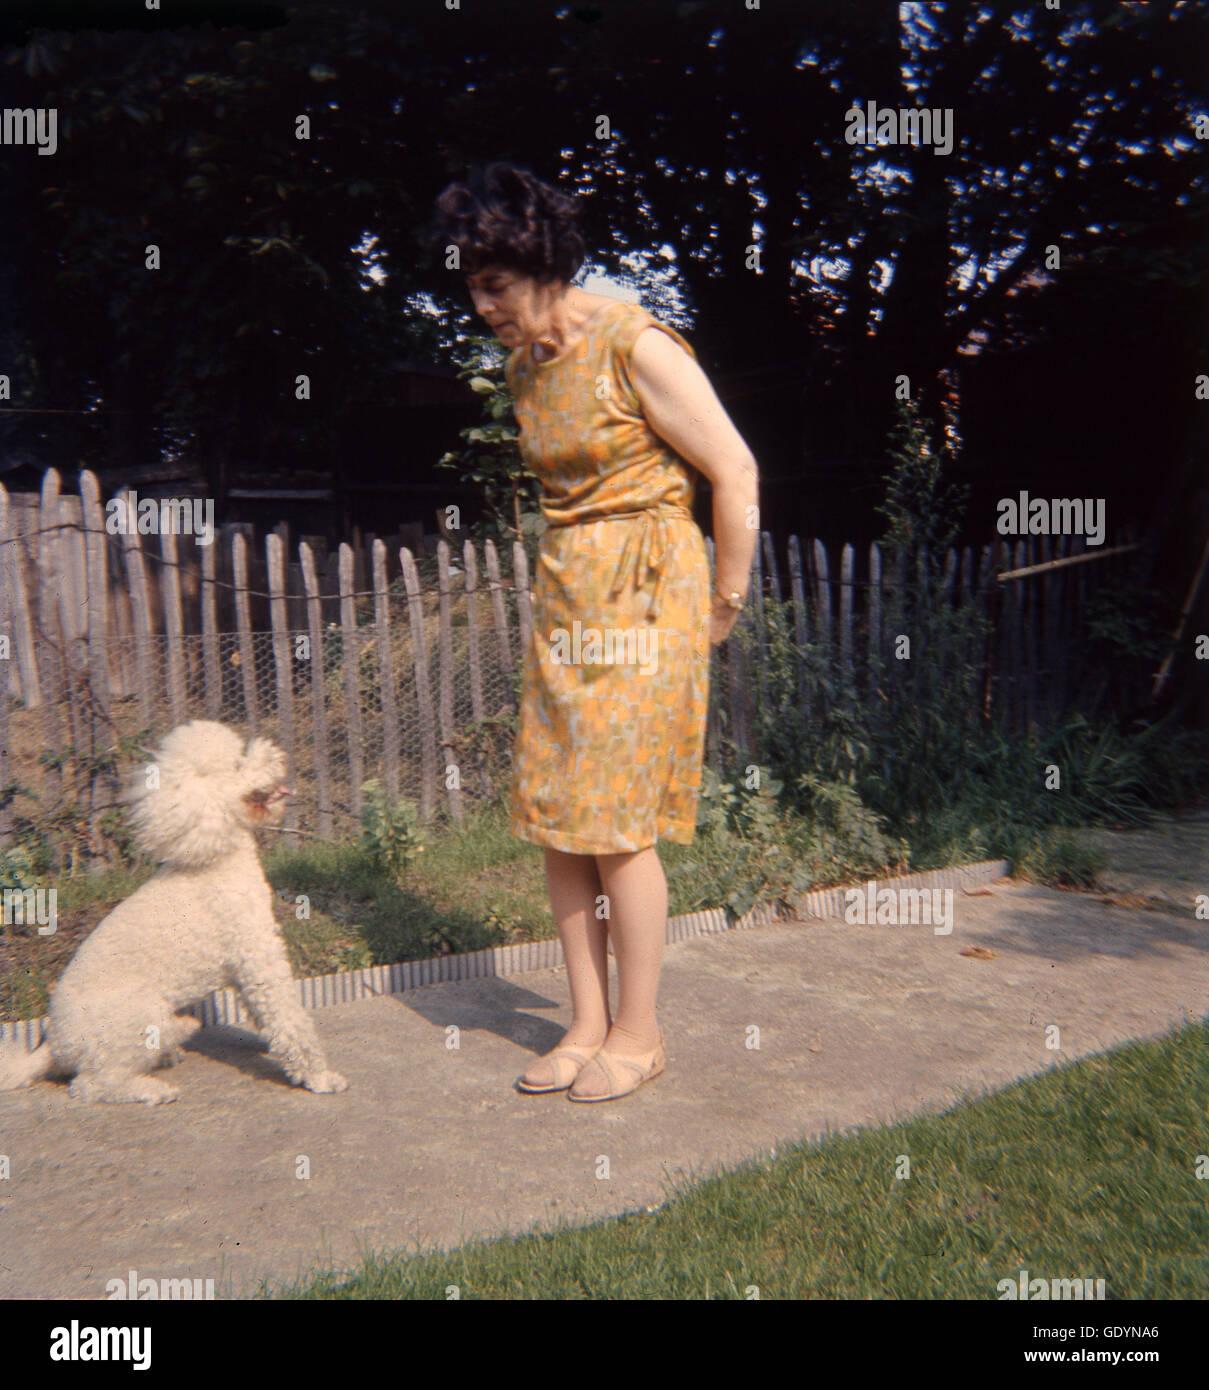 1970s, elderly lady training her small cream coated poodle dog to sit. - Stock Image